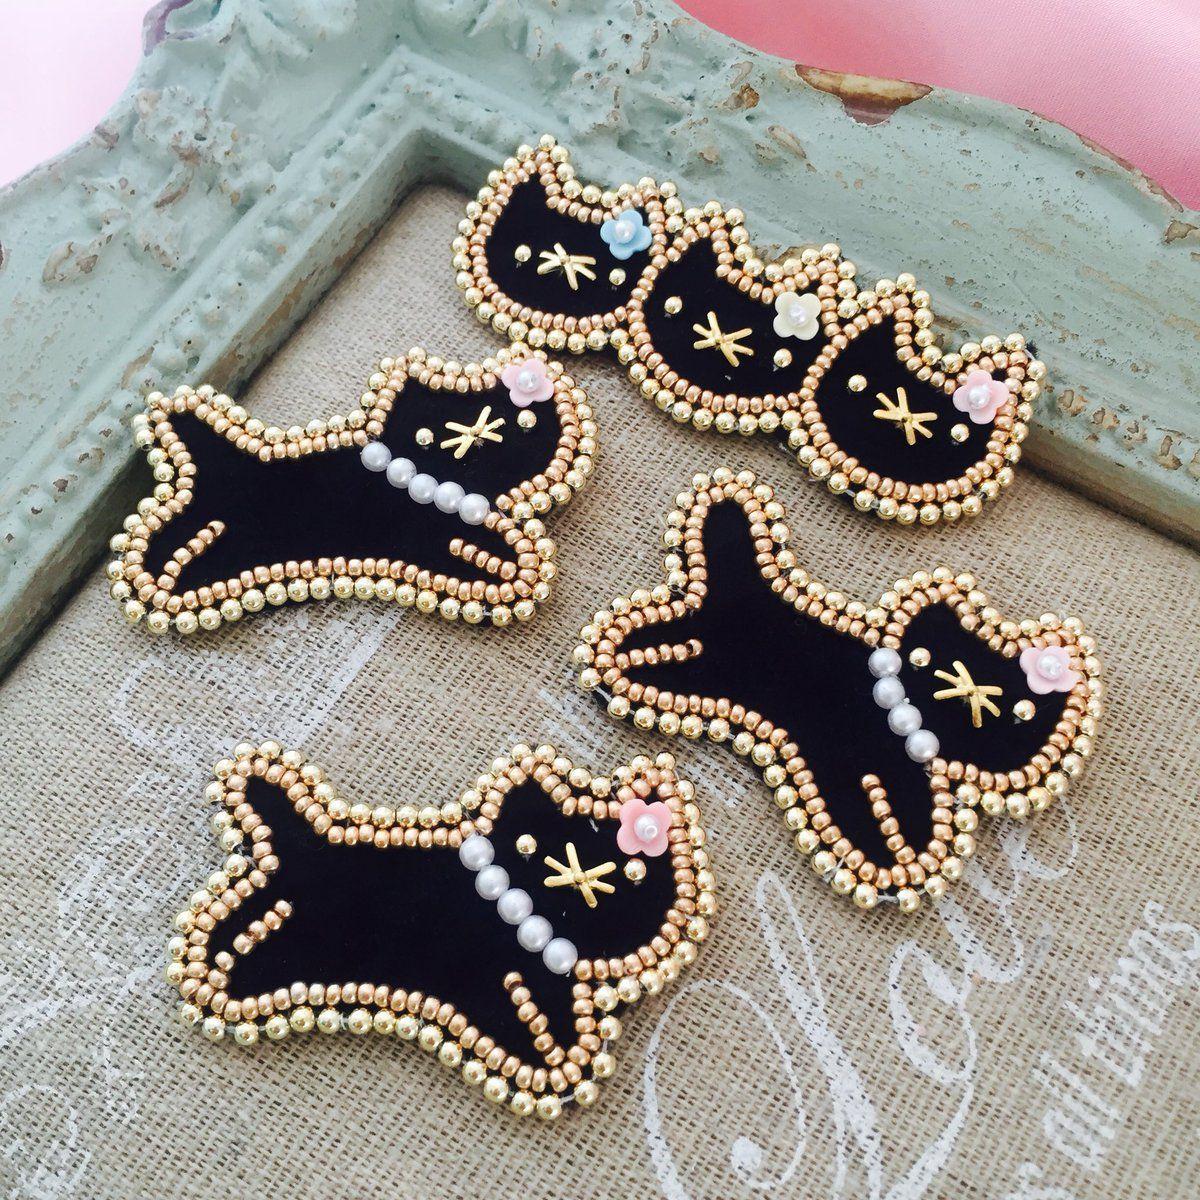 Вышивка кошки бисер схемы